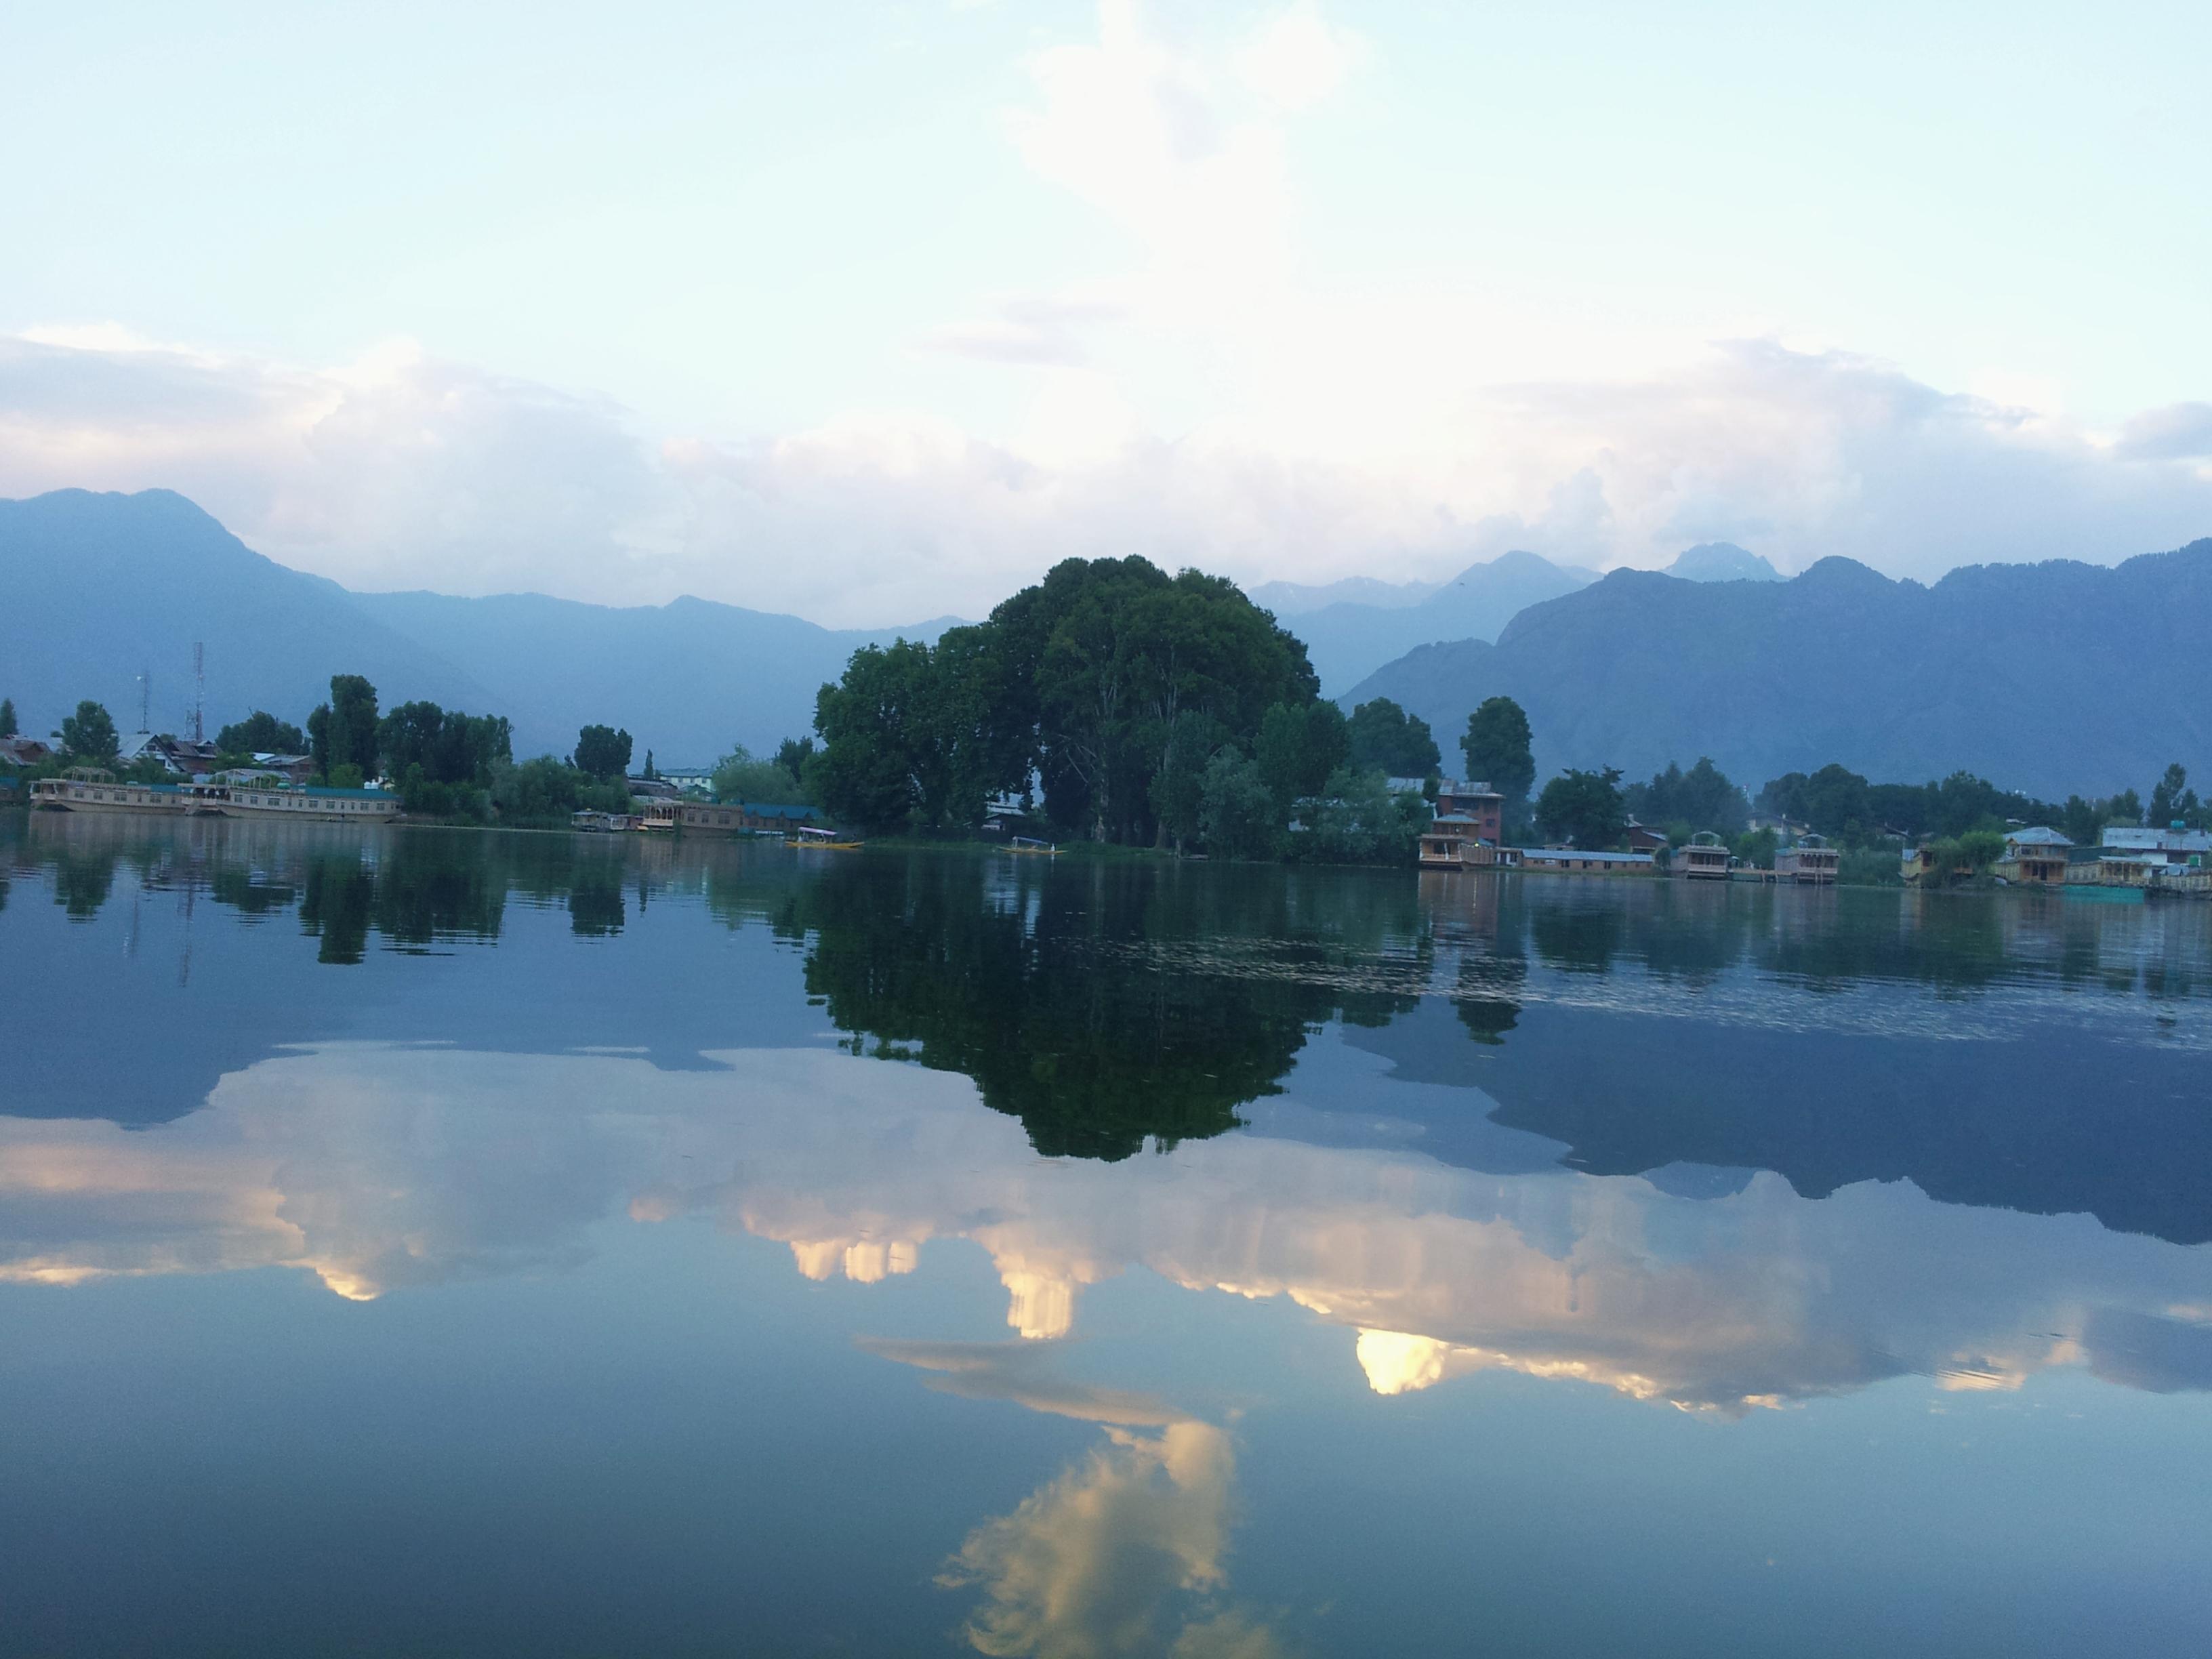 The_beautiful_Dal_lake_%28wiki_loves_earth_2017%29.jpg